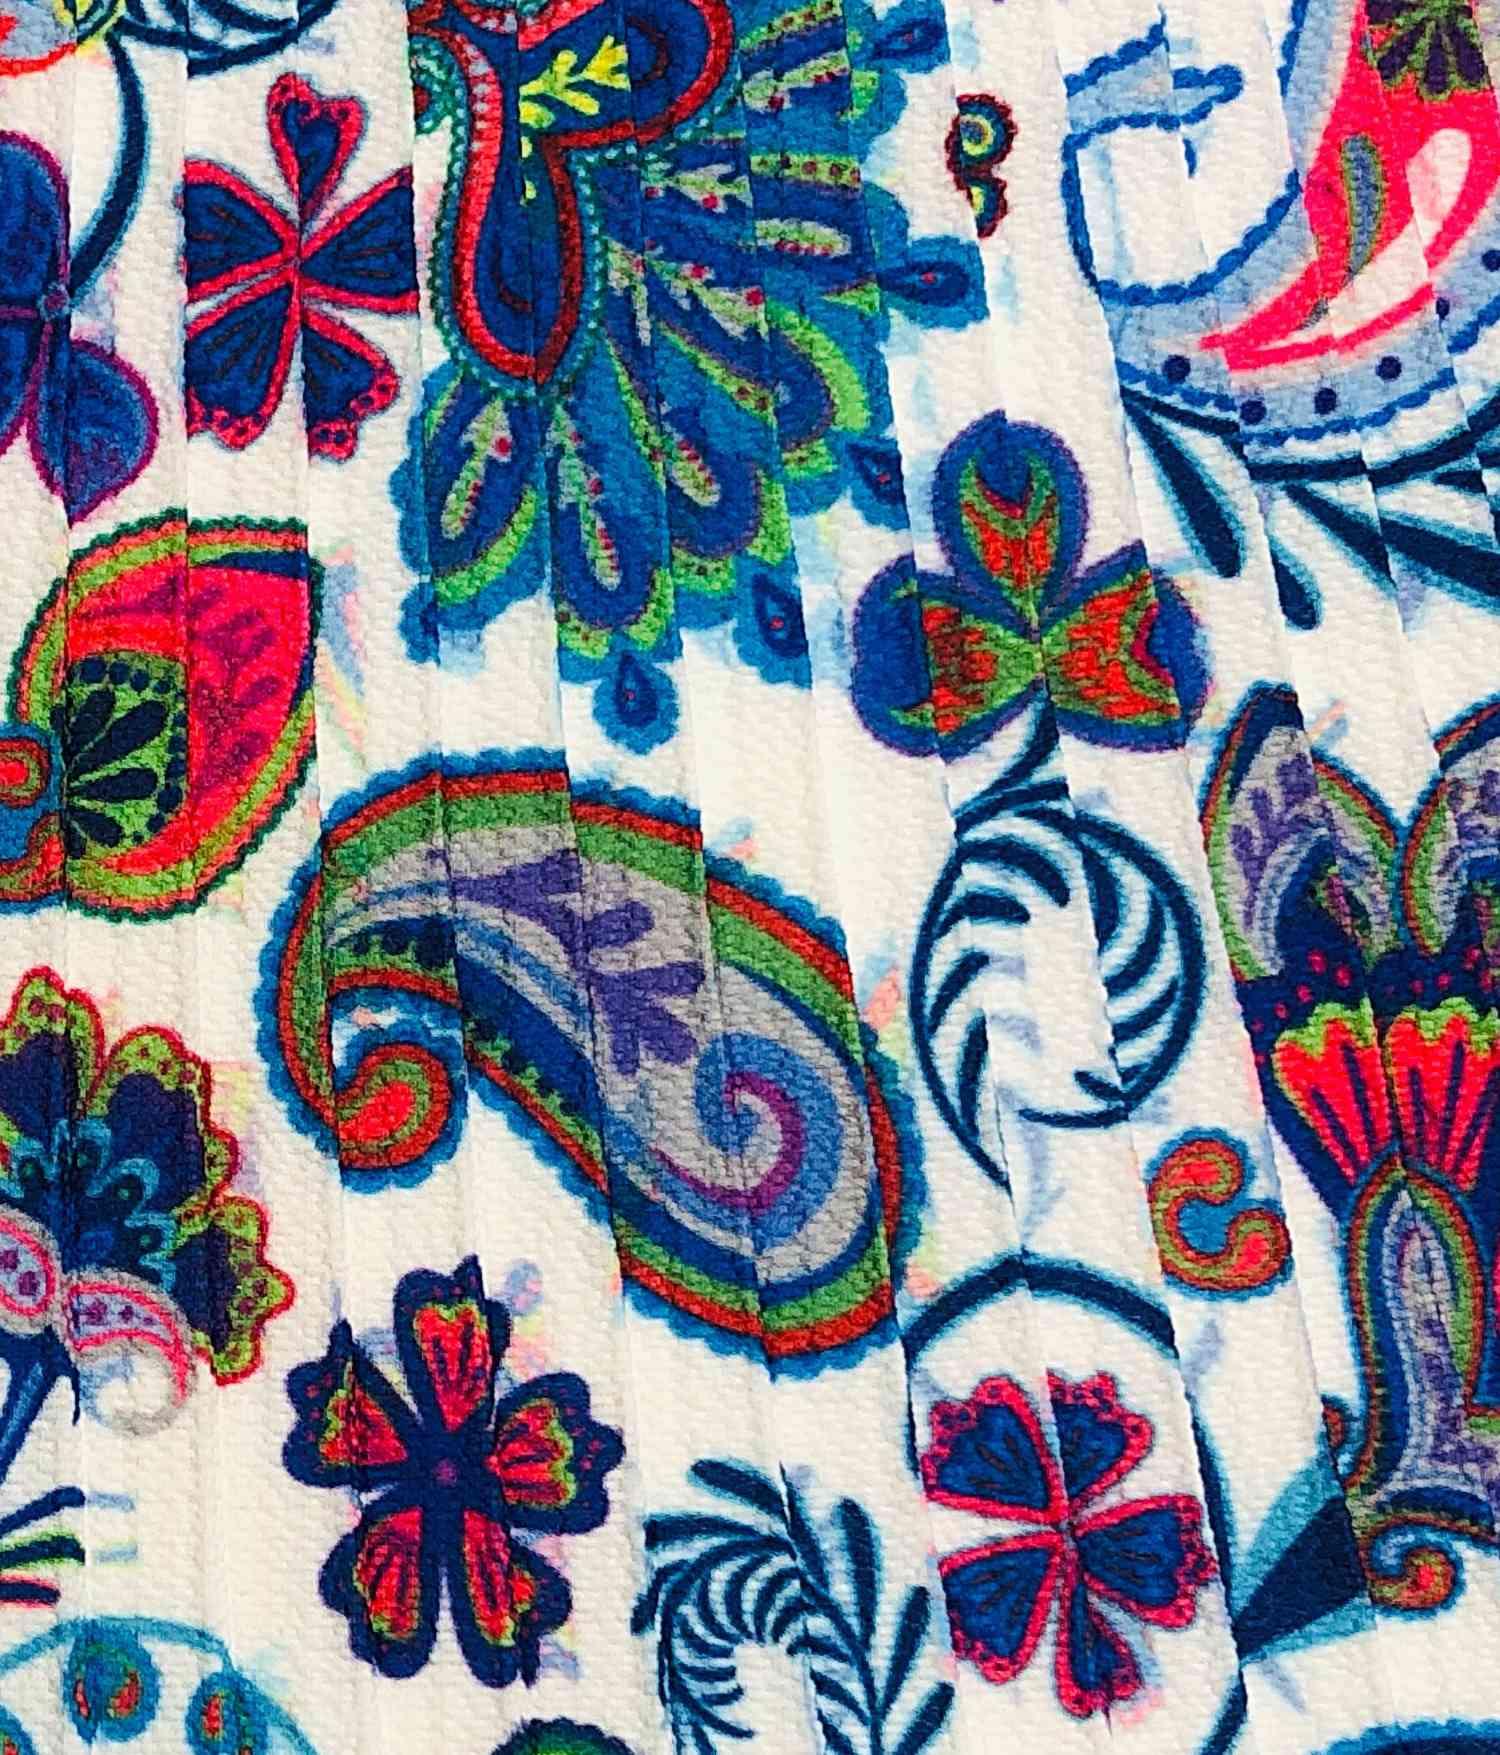 Printed Fabrics - butterminus 999 - BUTTERMINUS 999 Polyester Elastan